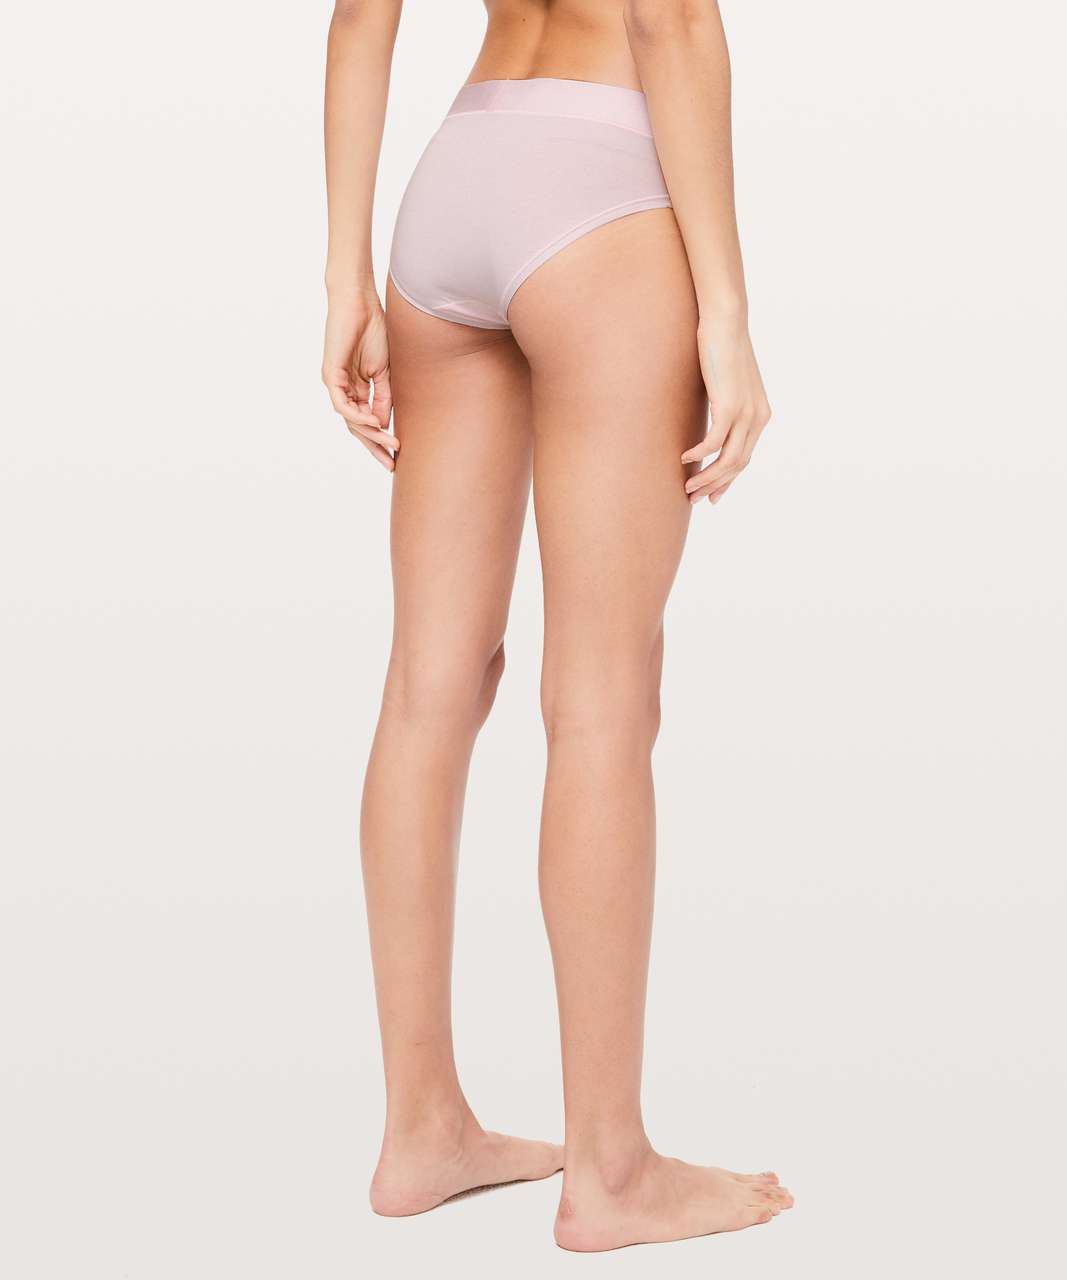 Lululemon Mula Bandhawear Bikini - Pink Glow